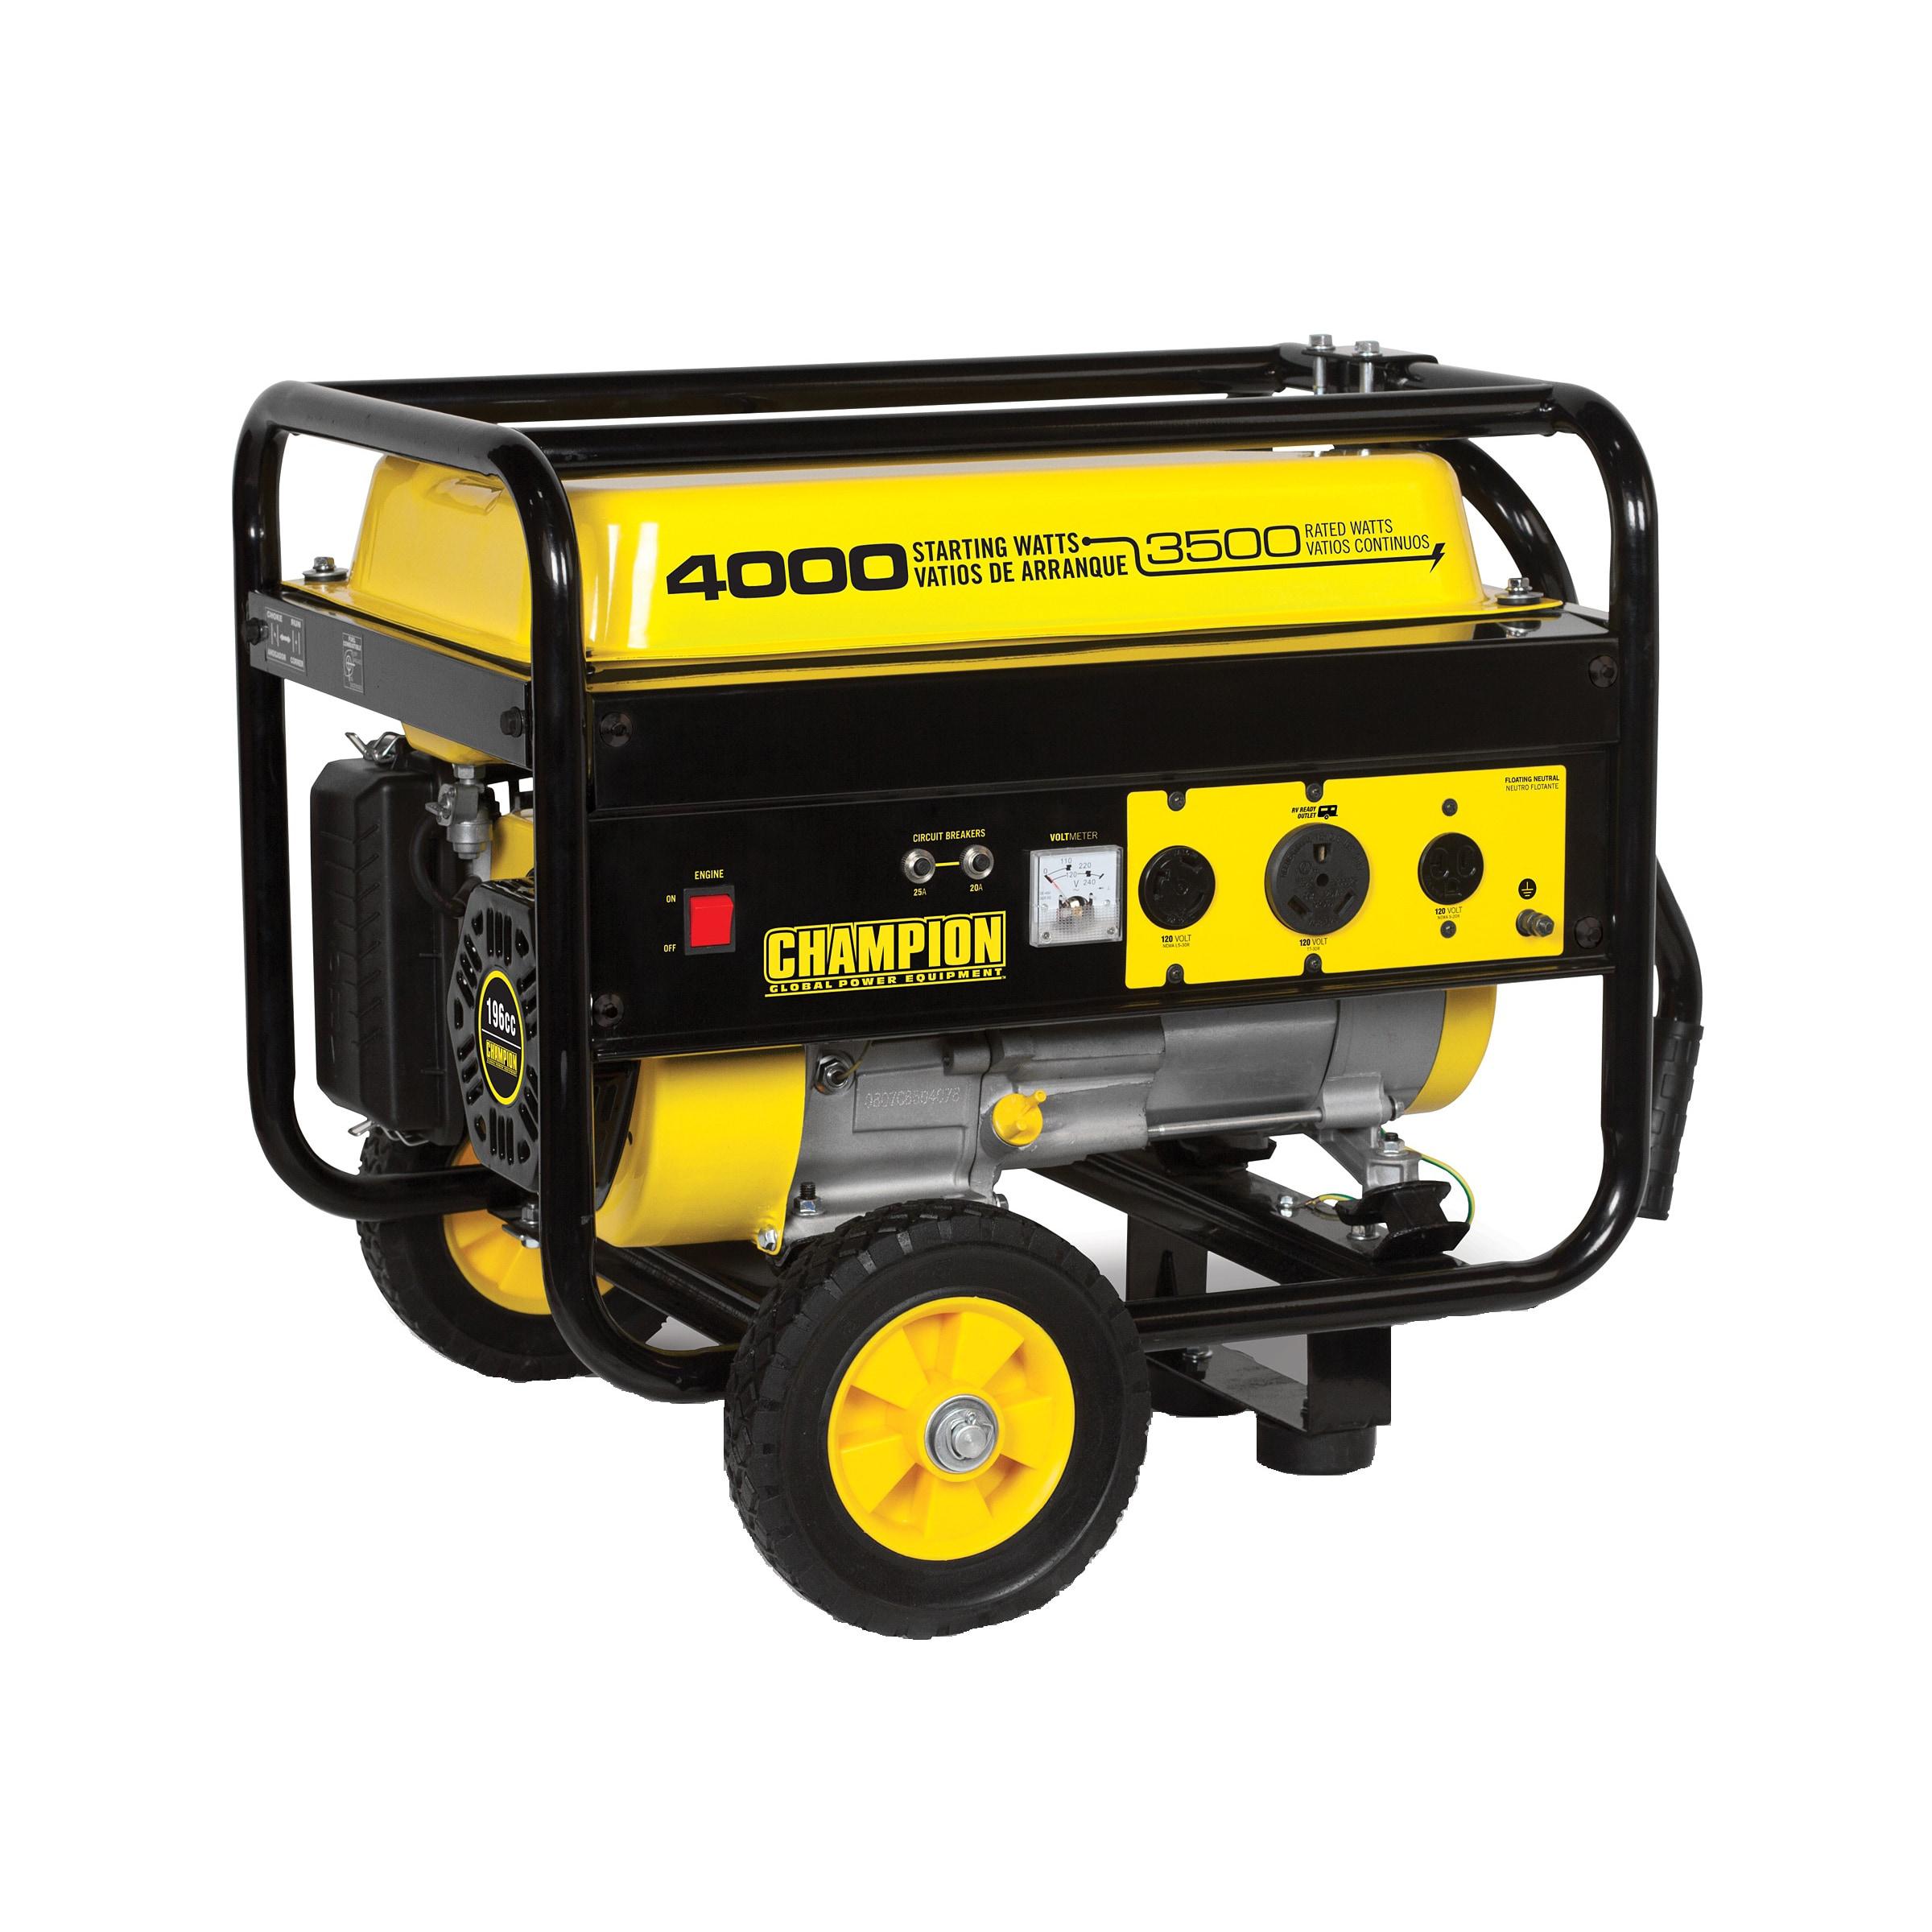 Champion Power Equipment 3500W 4000W 196cc Portable